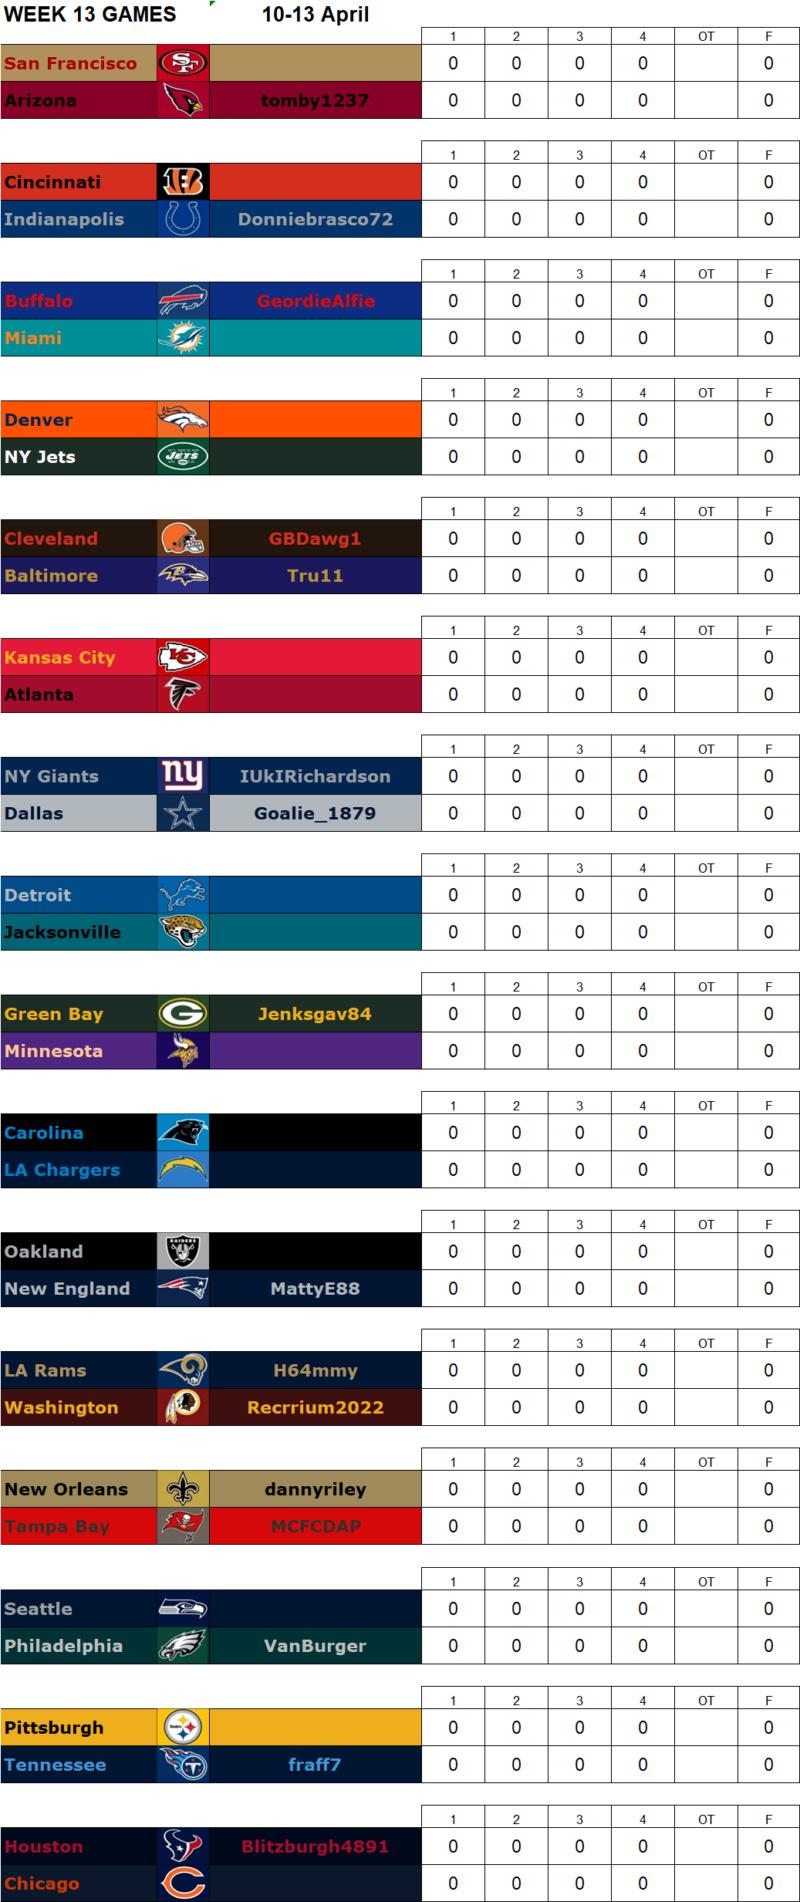 Week 13 Matchups, 10-13 April W13g16